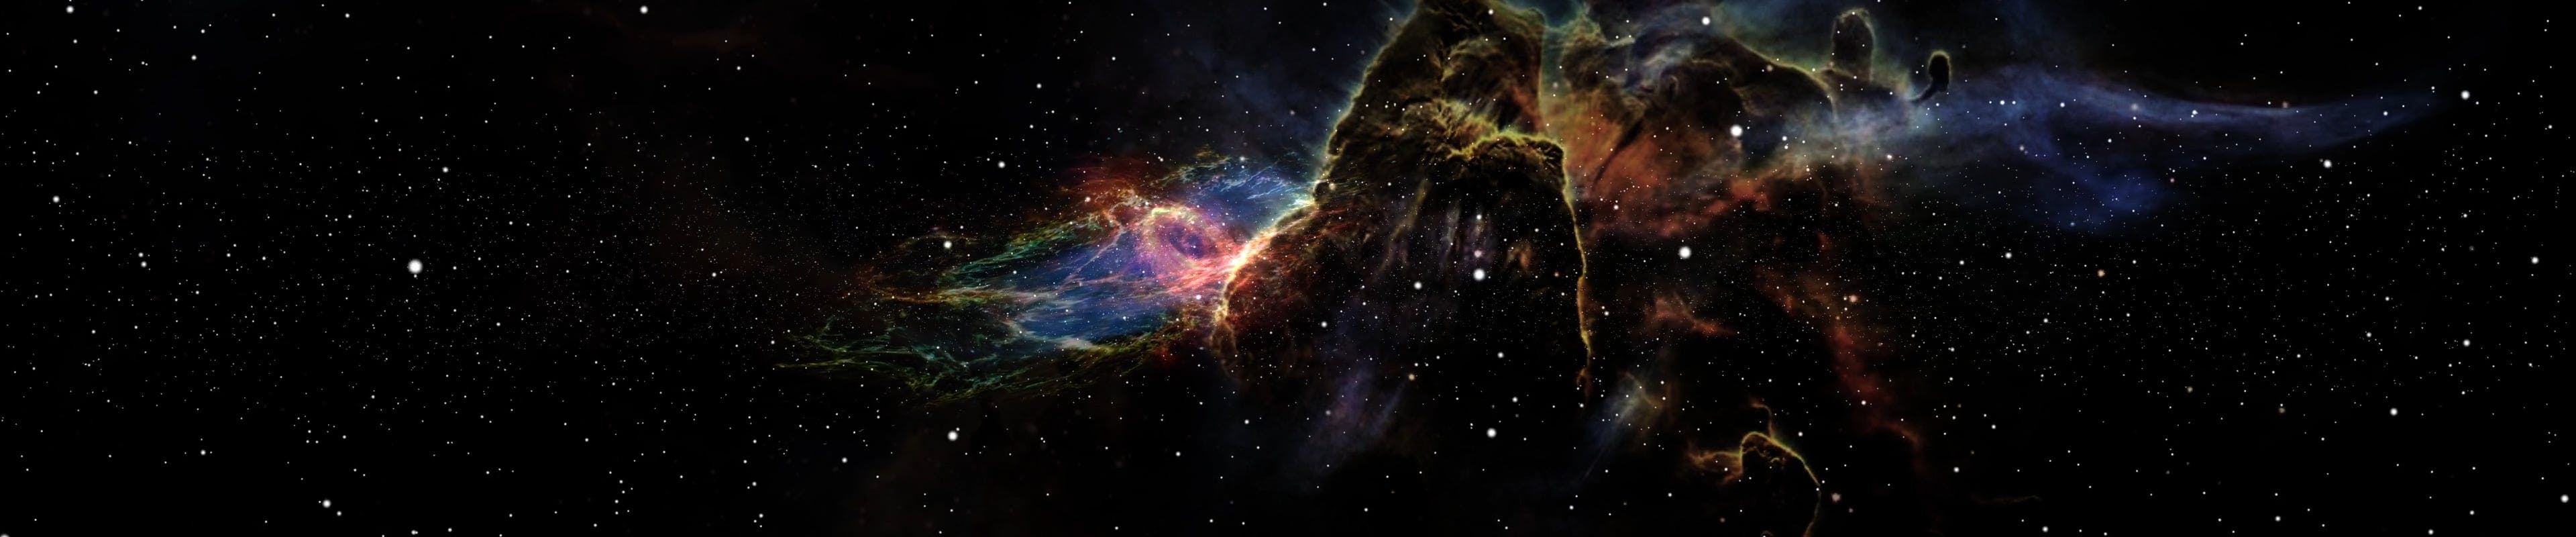 CGI Animation Of Galaxy